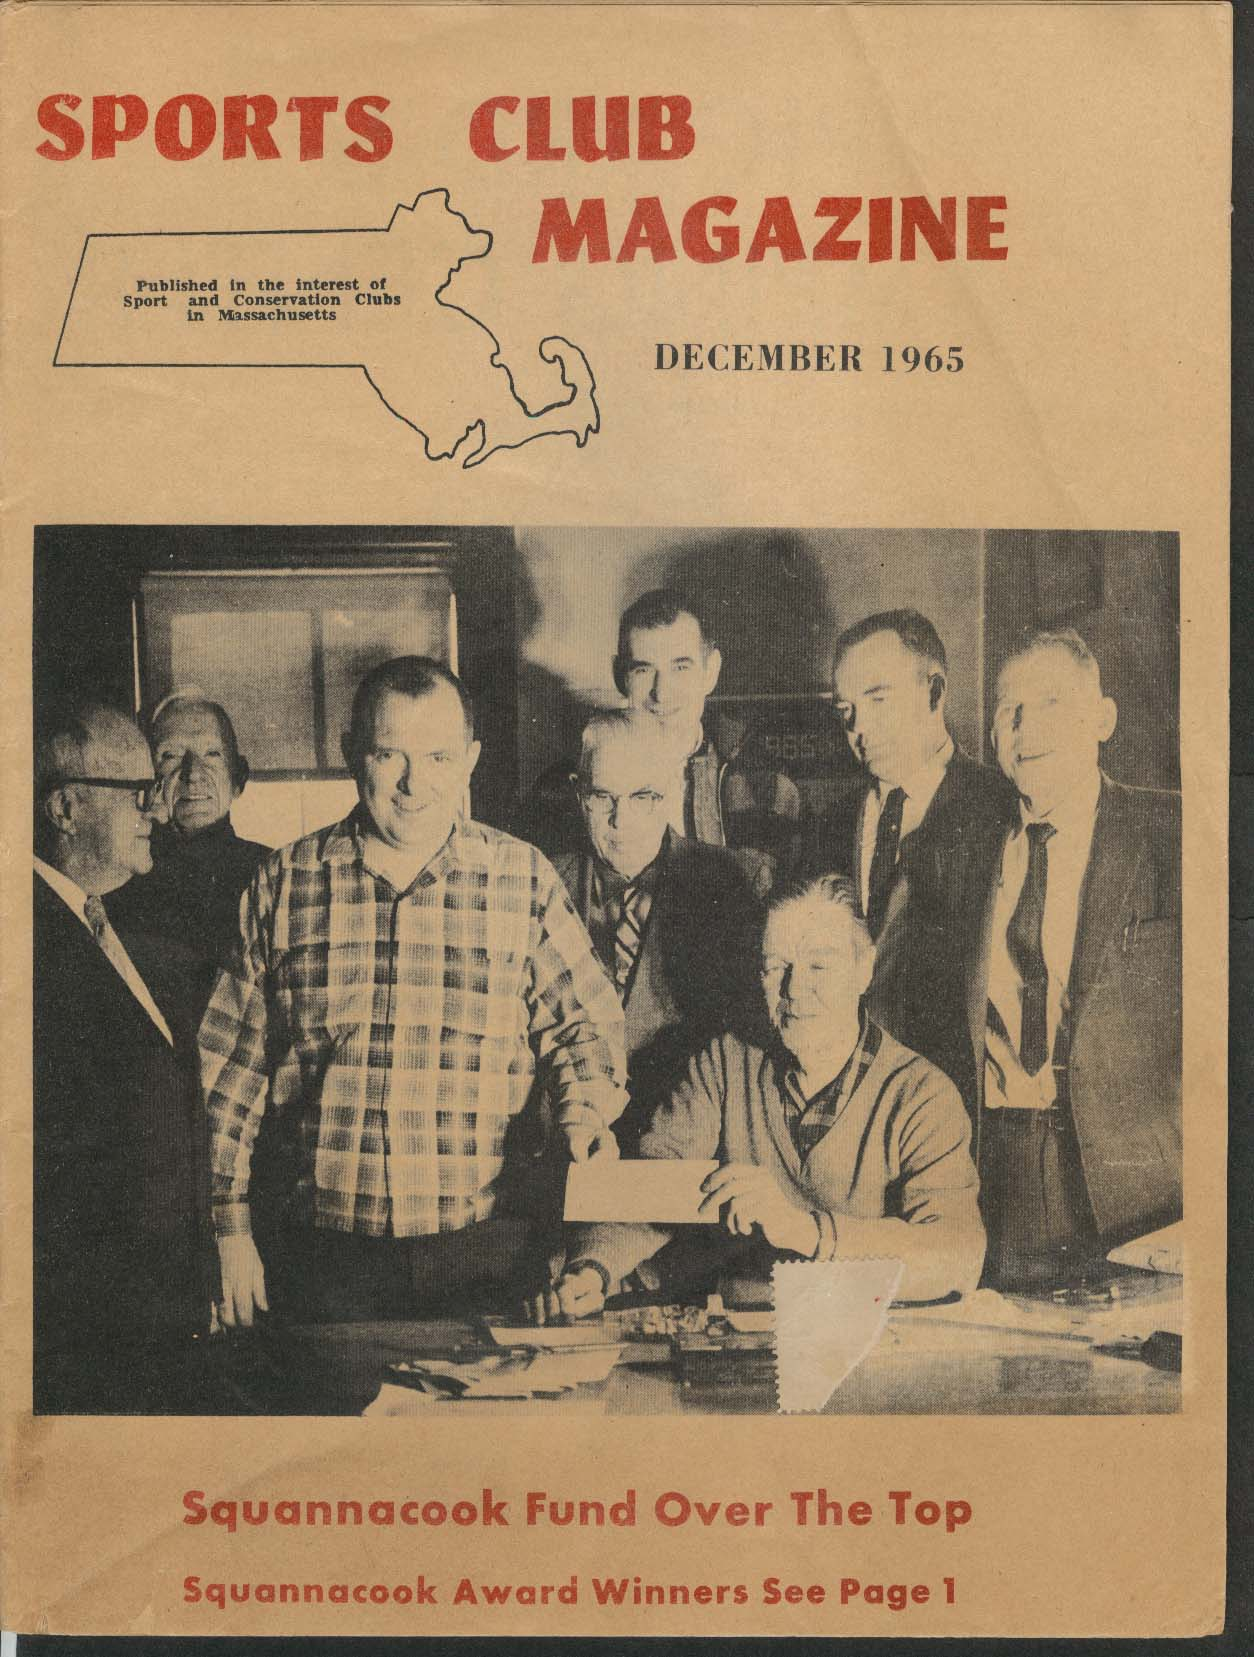 SPORTS CLUB MAGAZINE Squannacook Fund Bert Foss Lou Krouse 12 1965